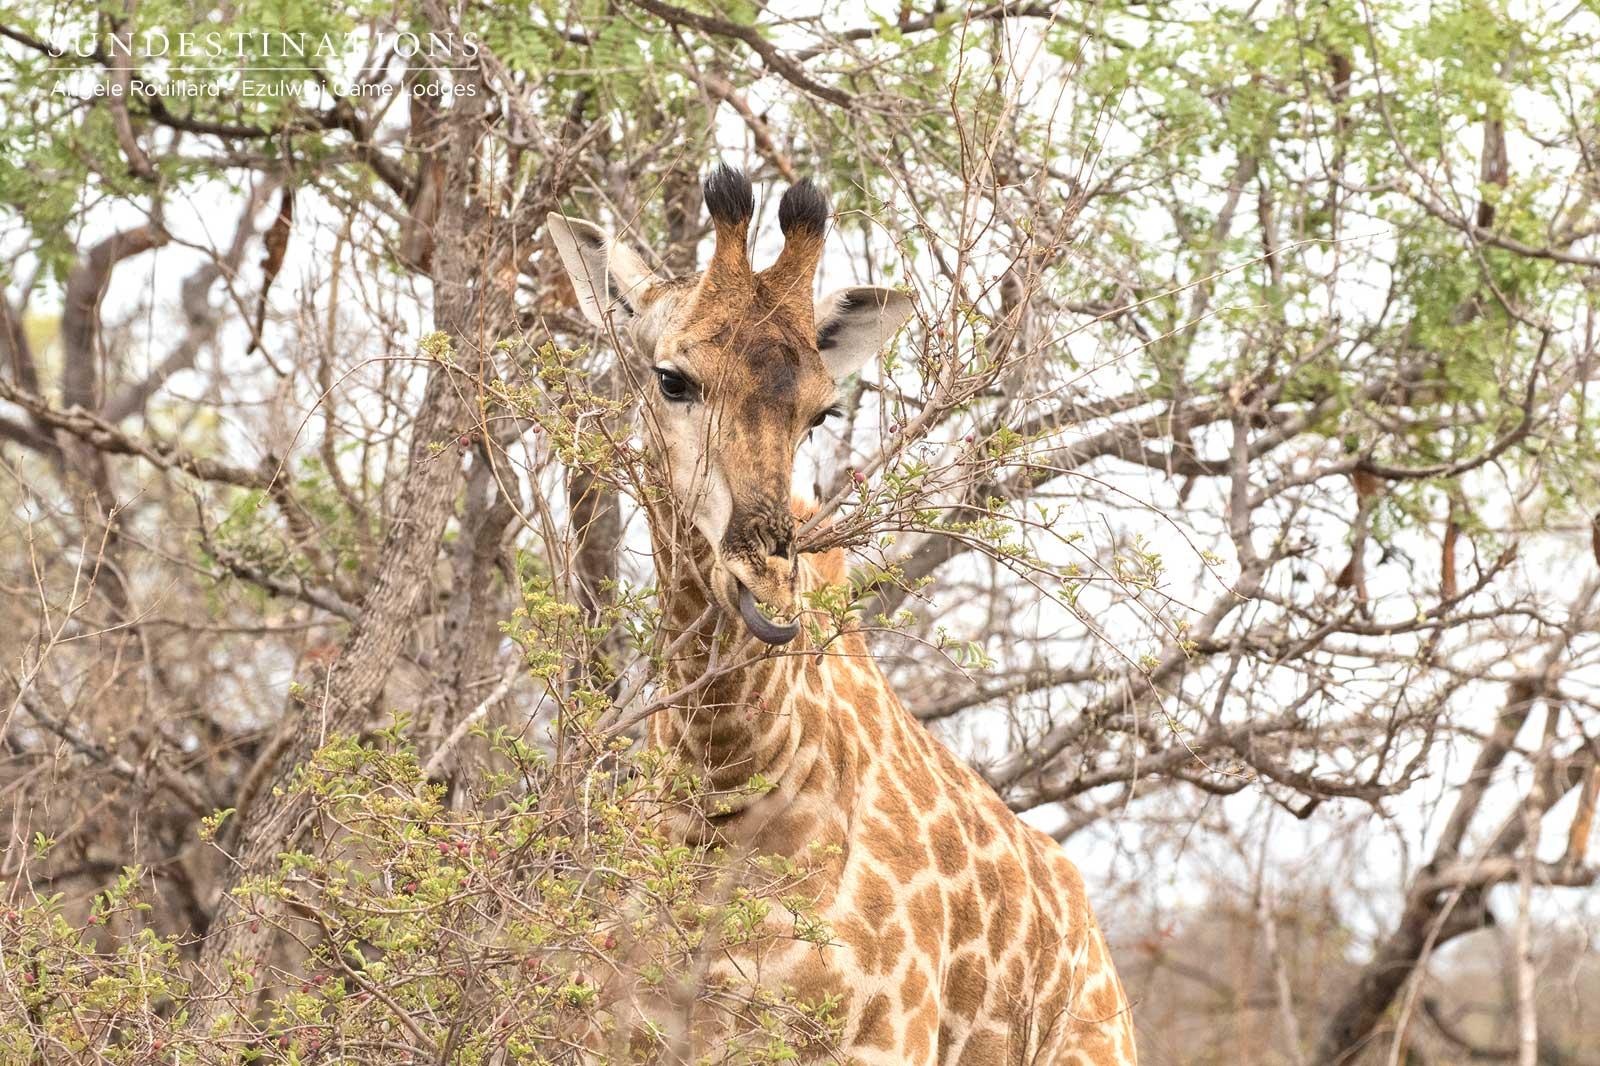 Giraffe in Balule